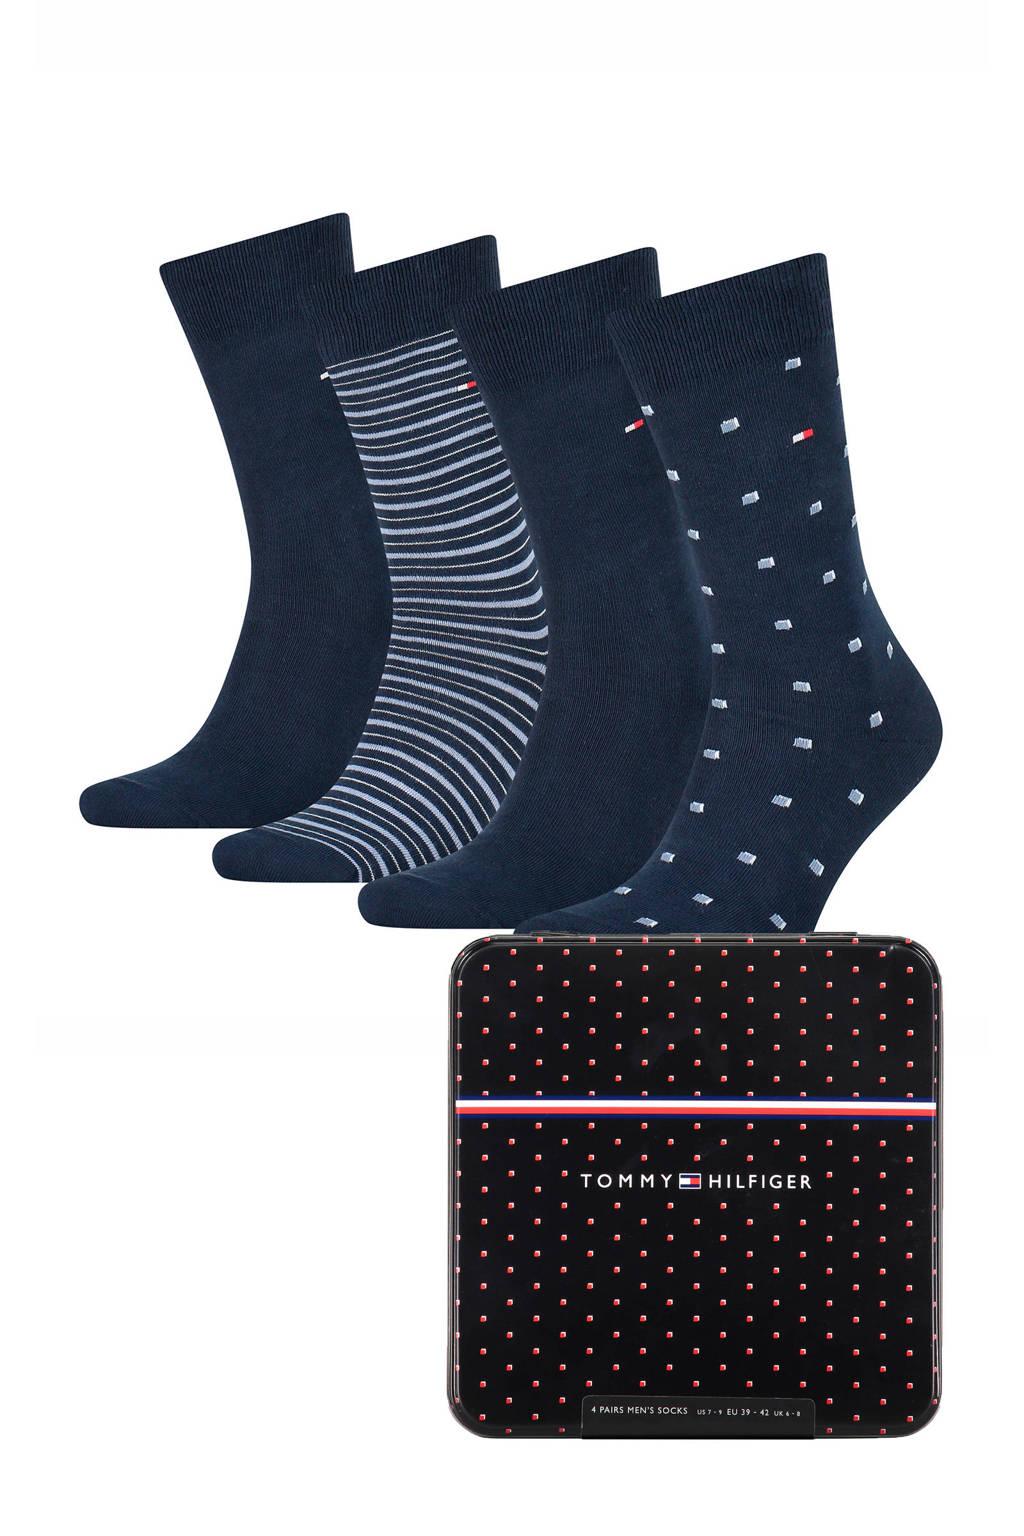 Tommy Hilfiger giftbox sokken - set van 4 donkerblauw, Donkerblauw